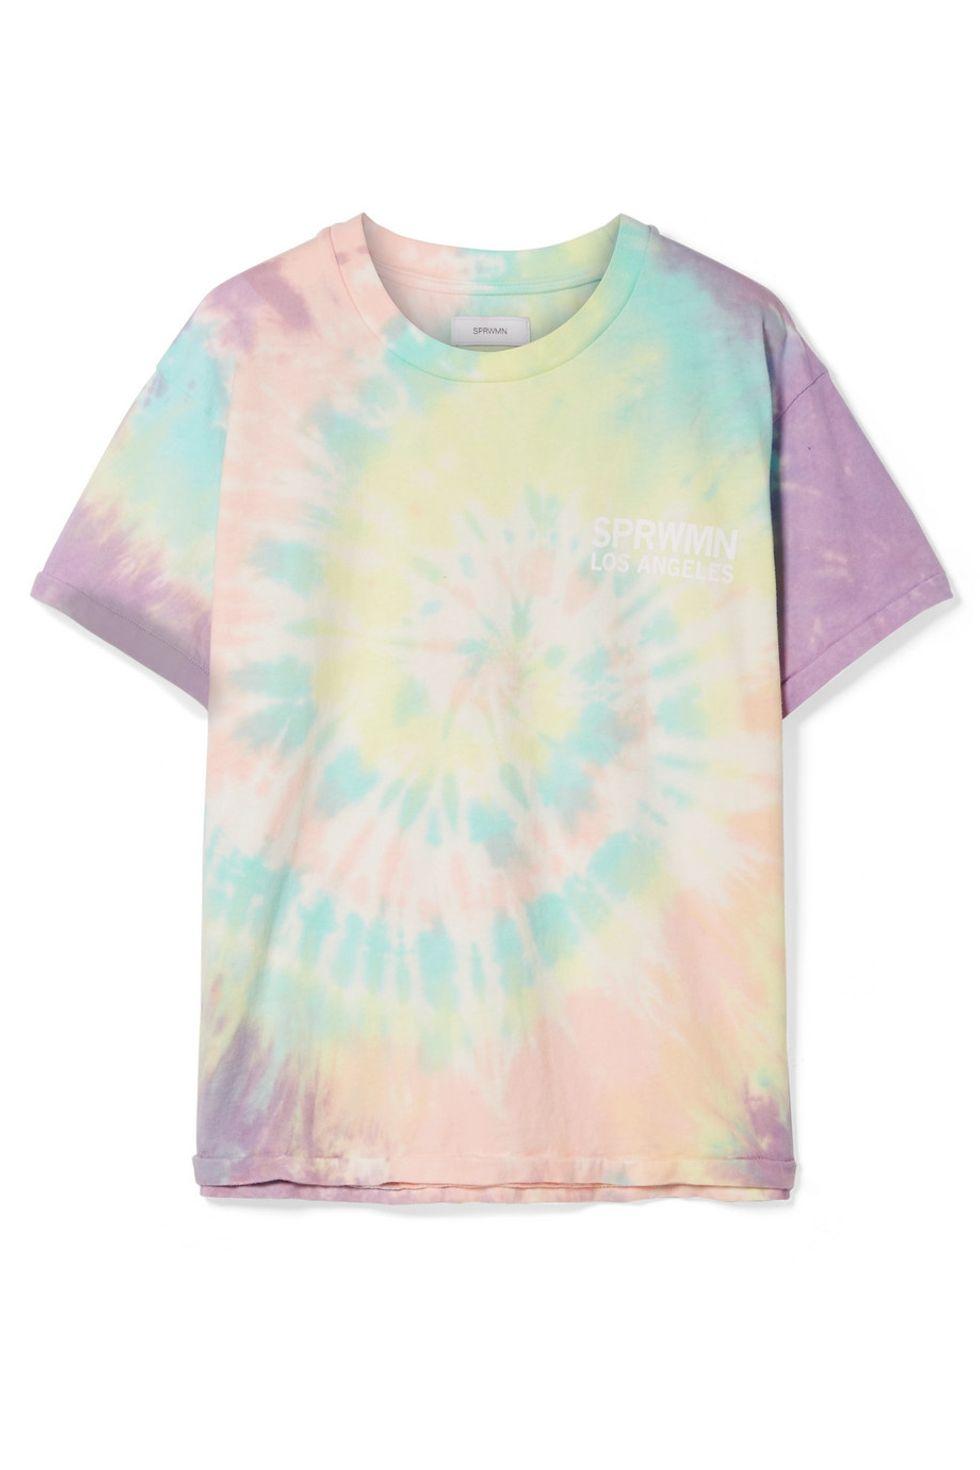 camisetas viralizar look instagram_SPRWMN